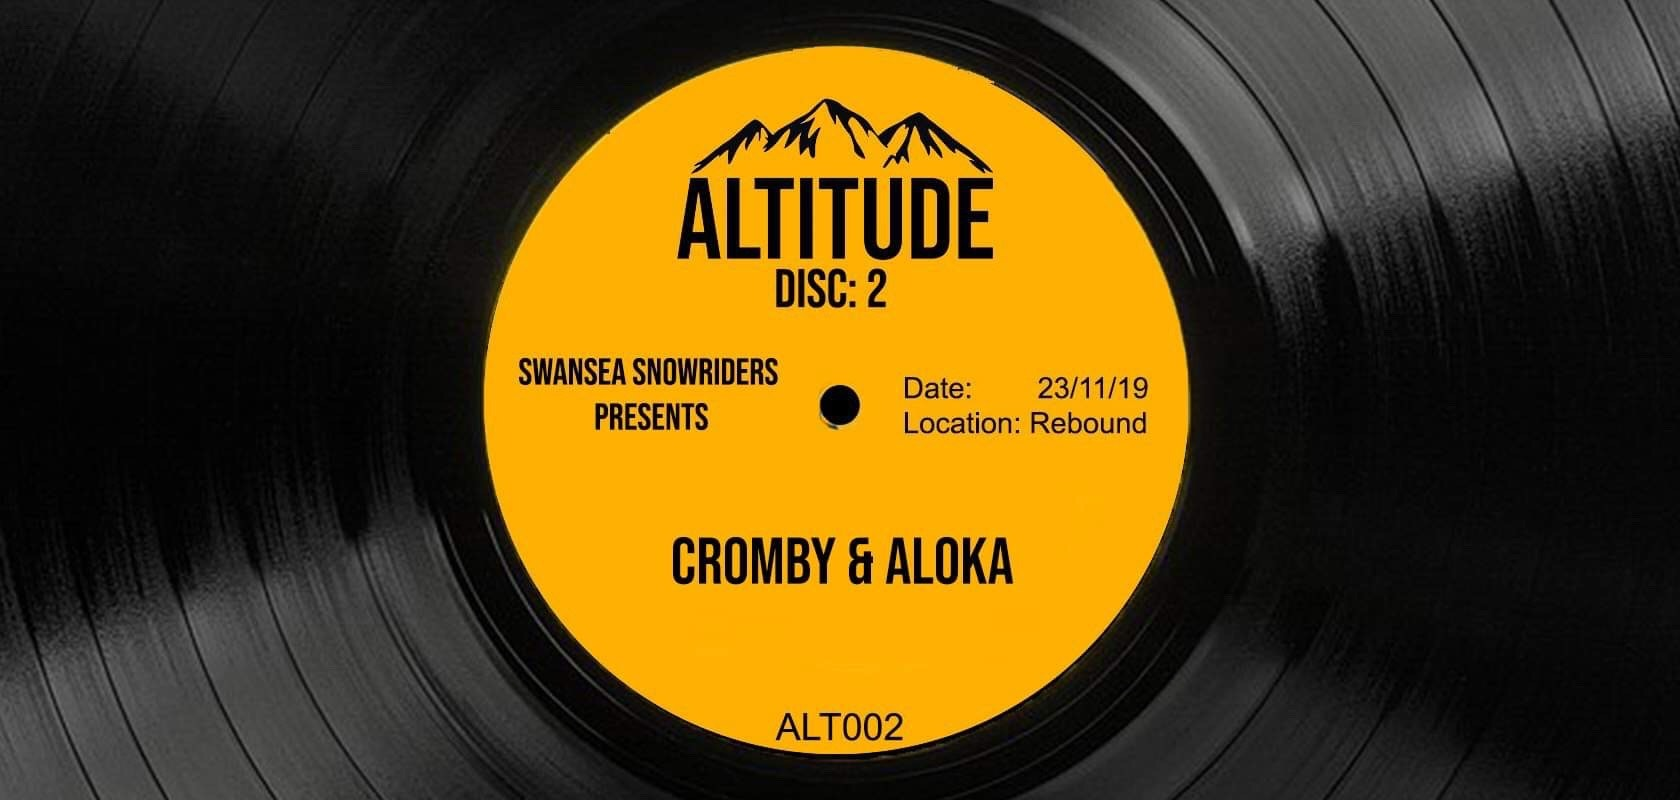 Altitude DISC: 2 w/ Cromby & Aloka